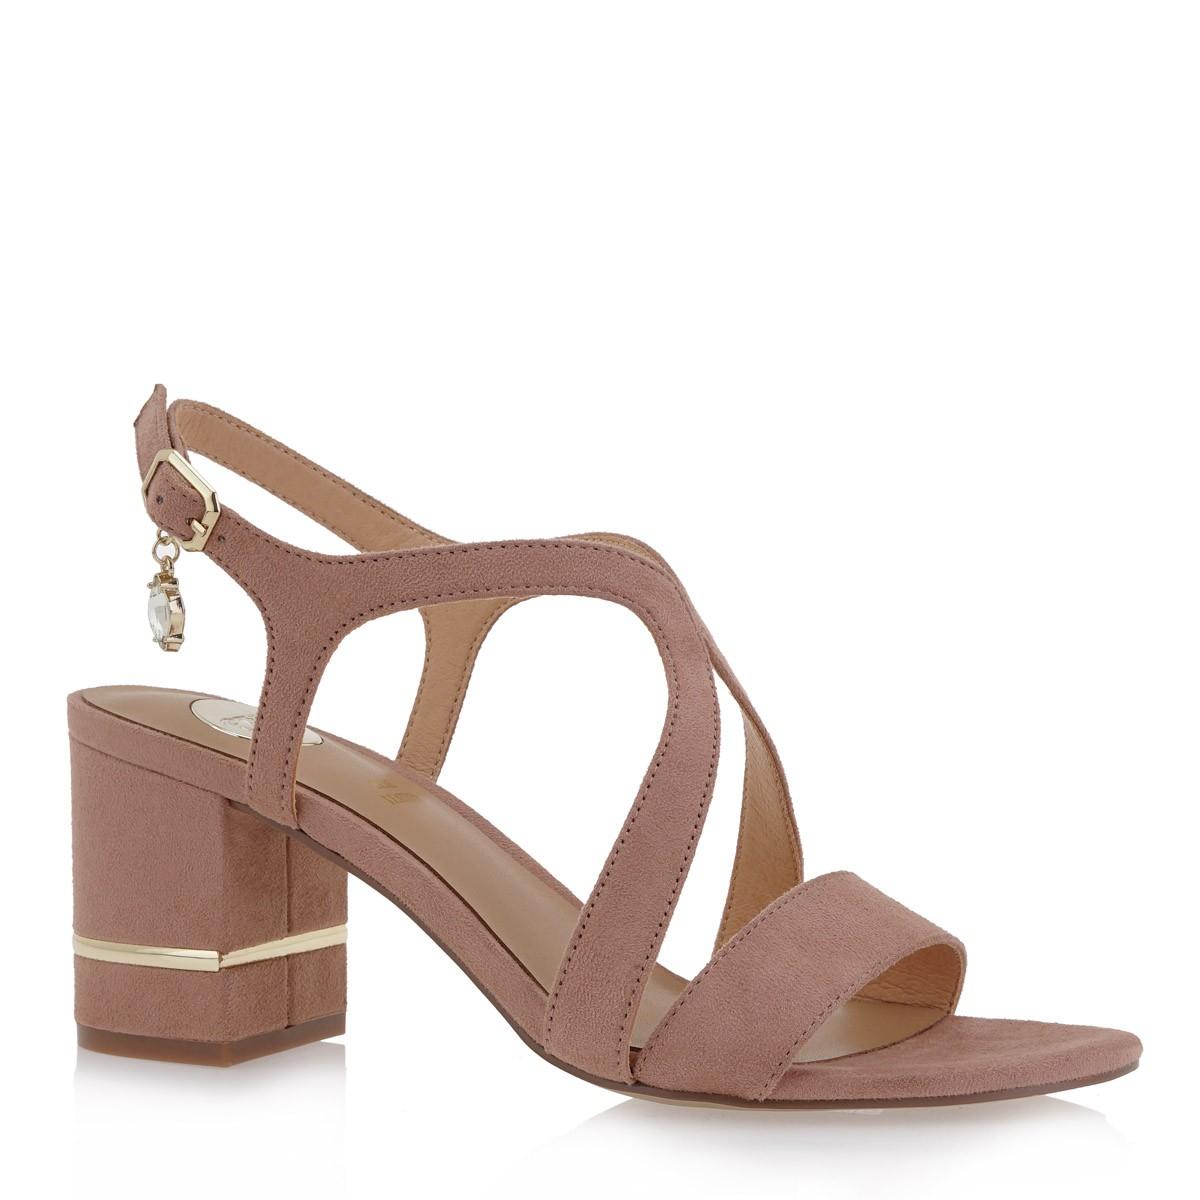 EXE Shoes Πέδιλα Γυναικεία 674-PENNY-672 Nude Καστόρι K4700674471D